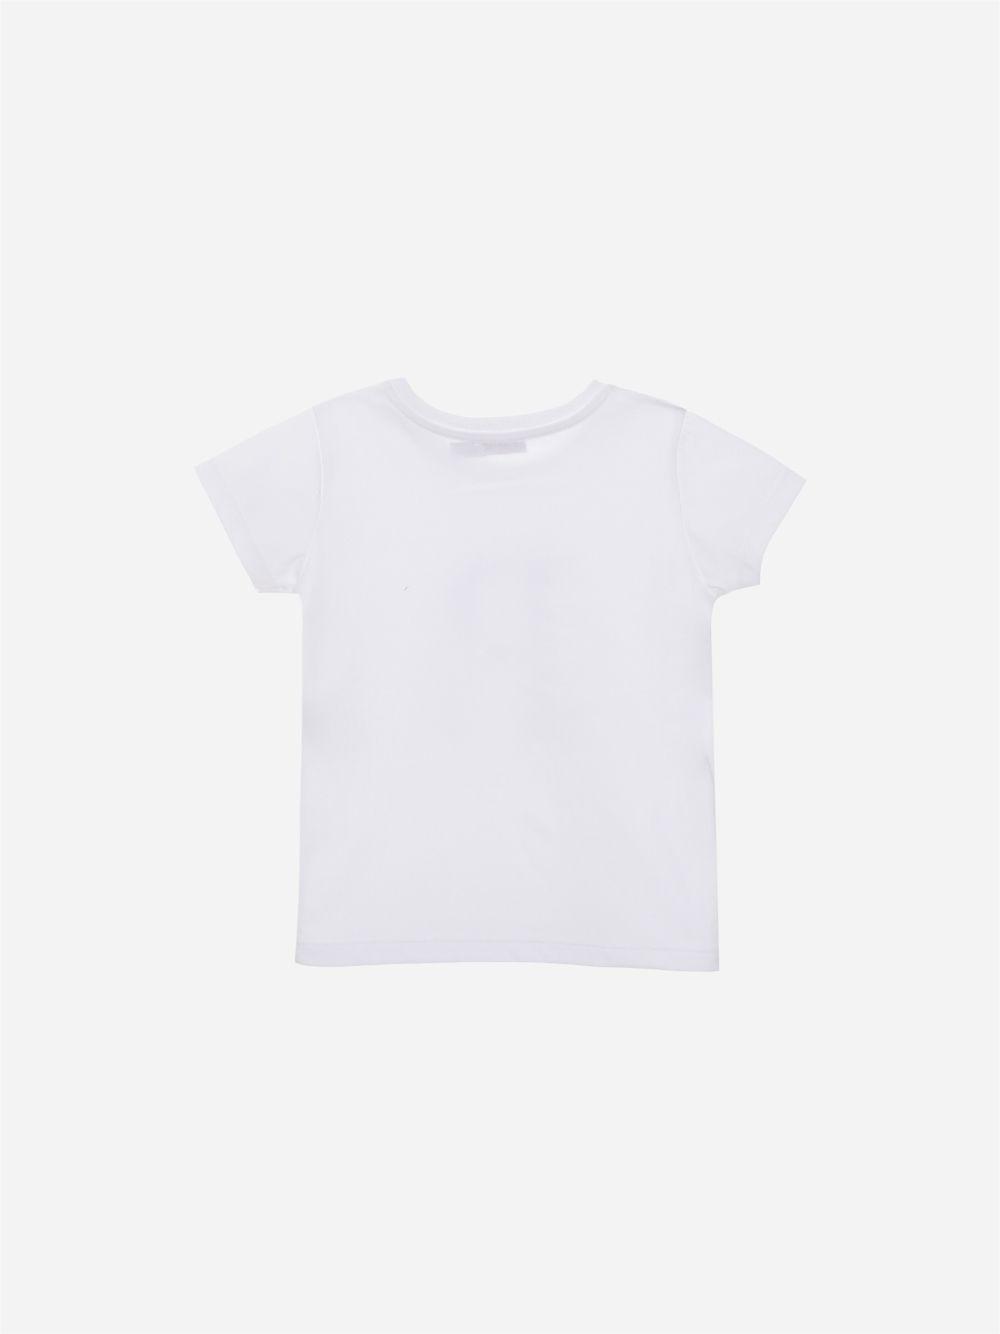 T-shirt em Jersey Branco Barco